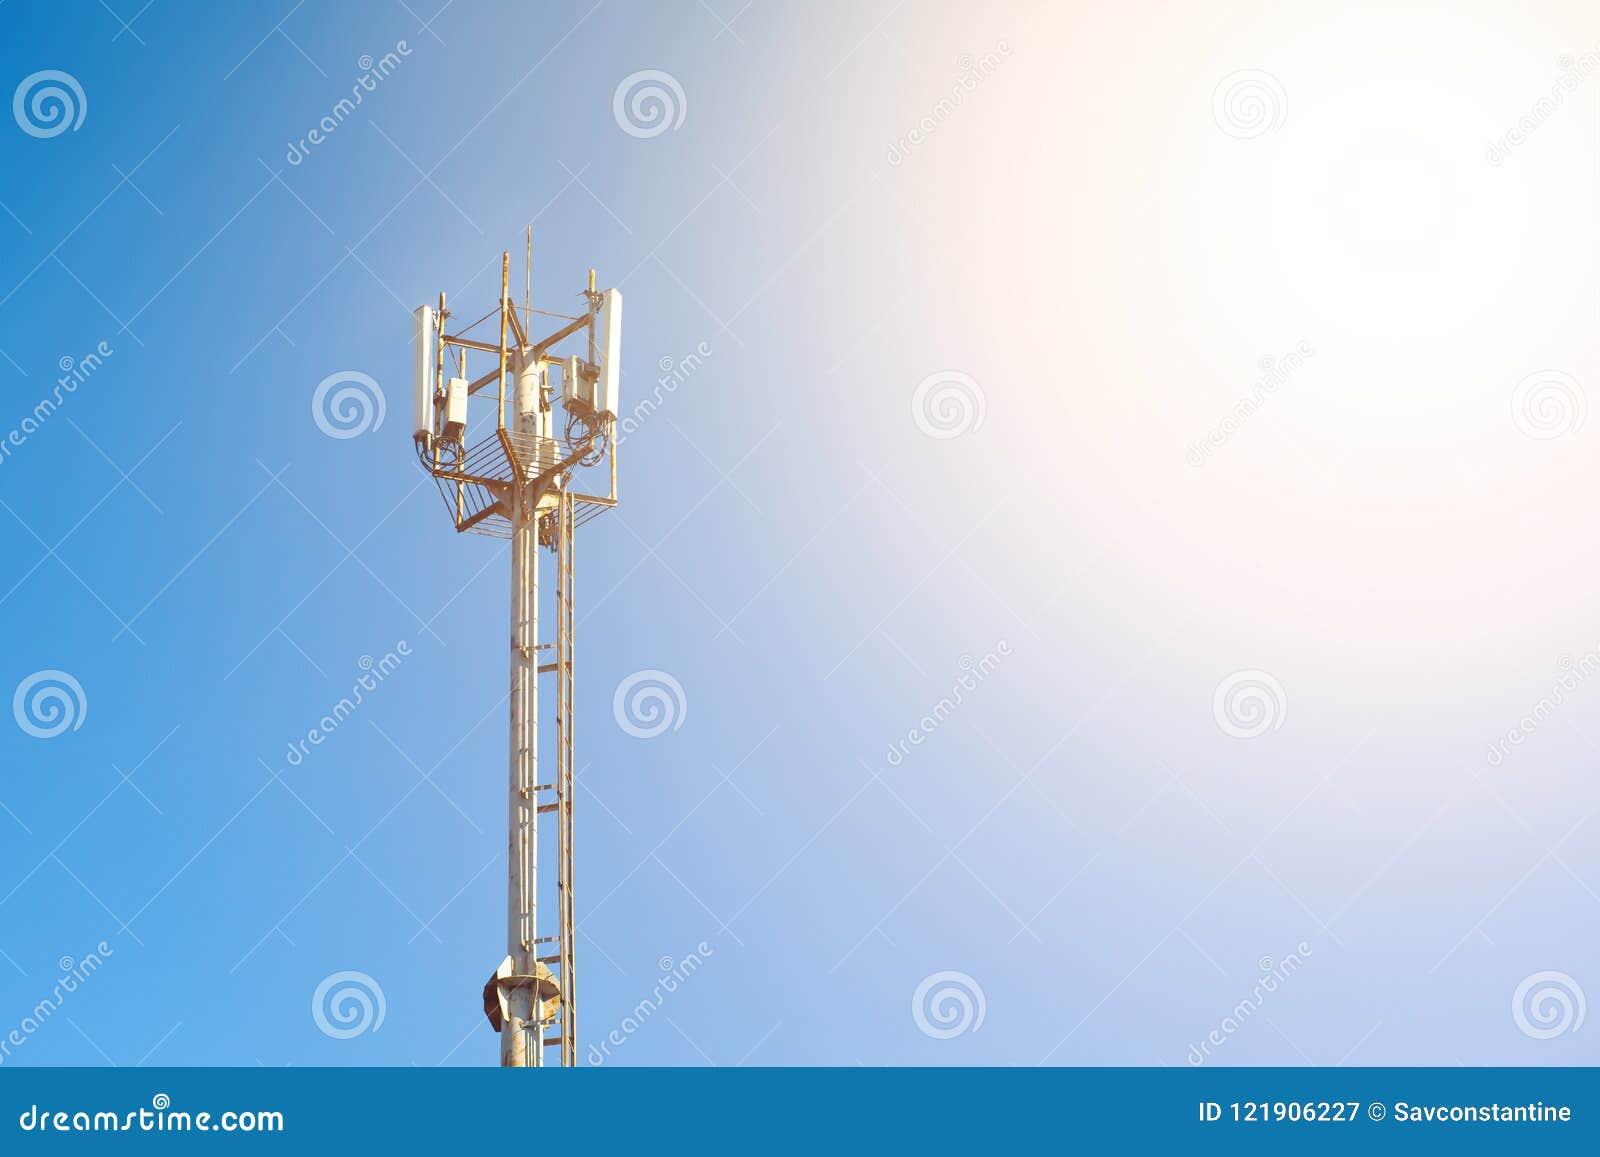 Tower stock image  Image of communicate, equipment, landscape